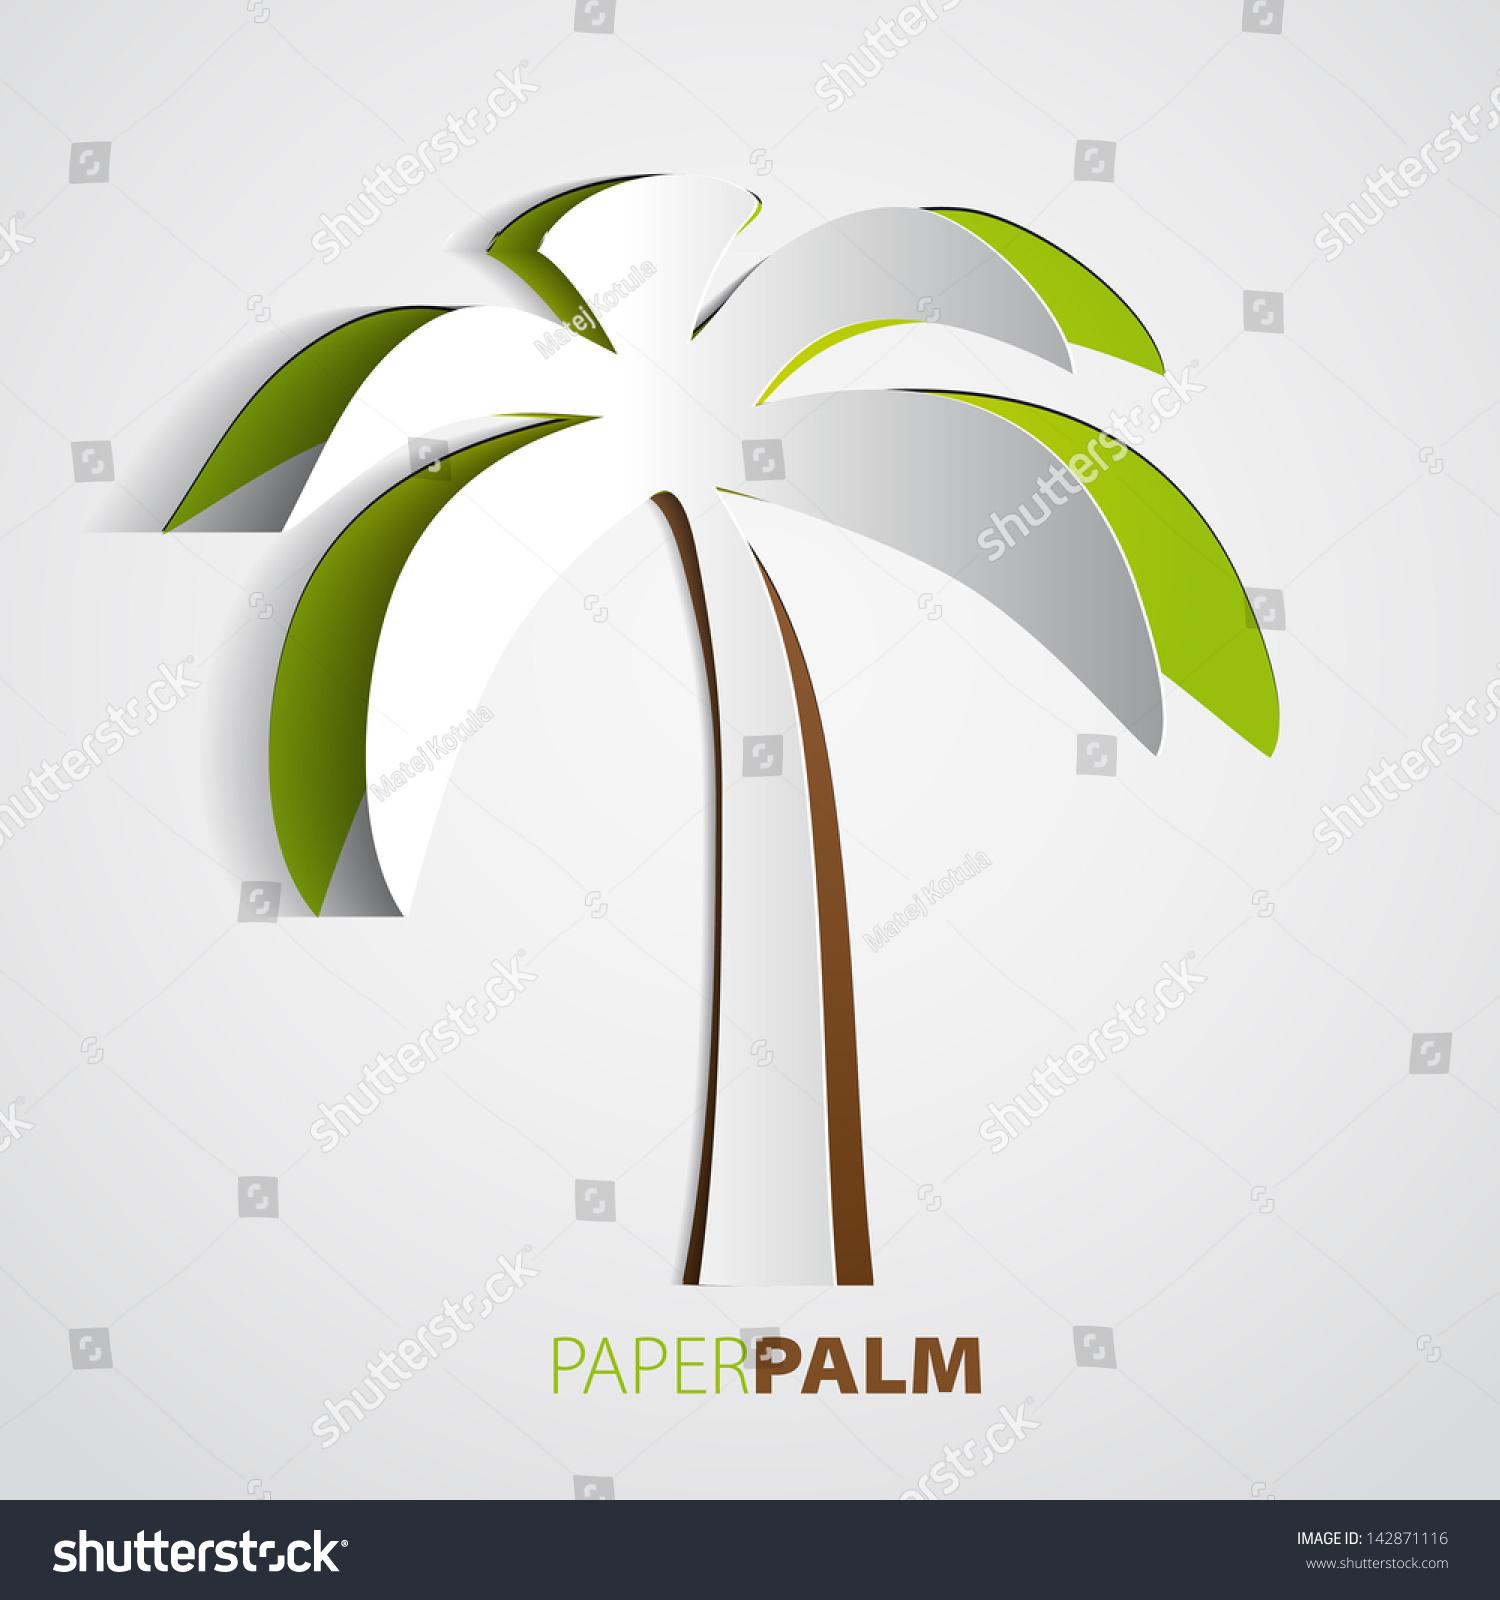 Пальмы из бумаги